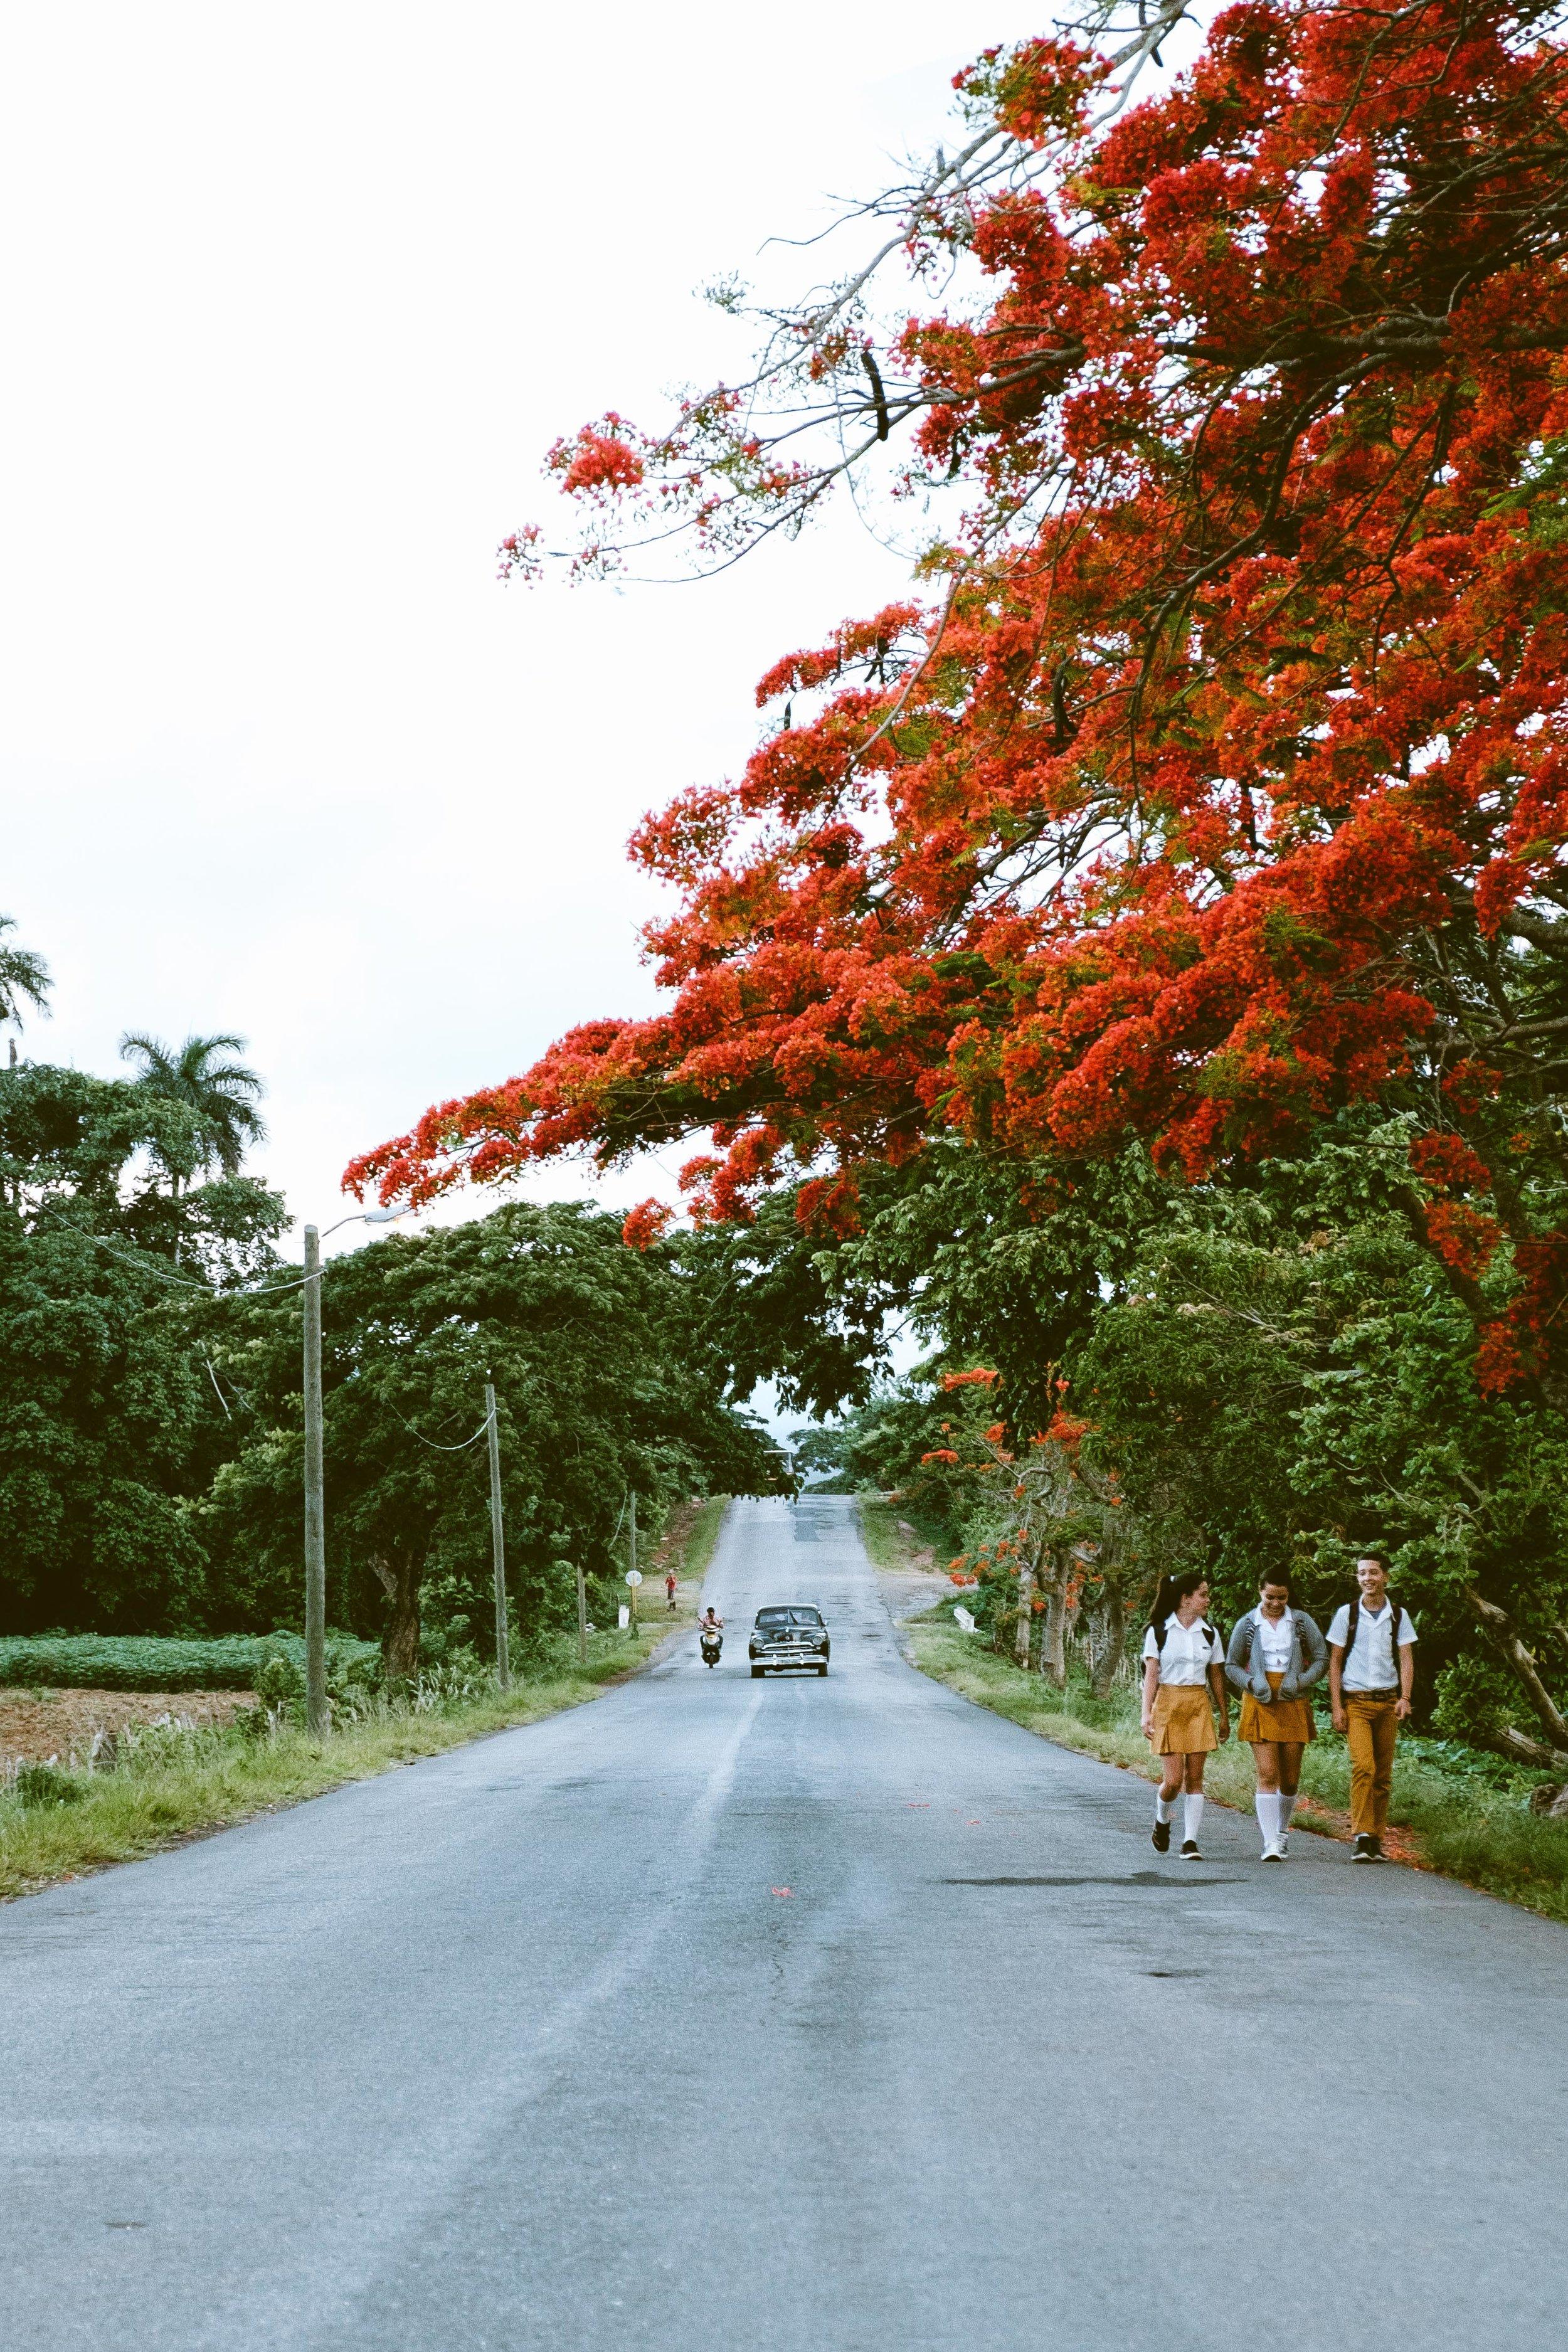 Cookwilltravel - Cuba - DSCF8215.jpg